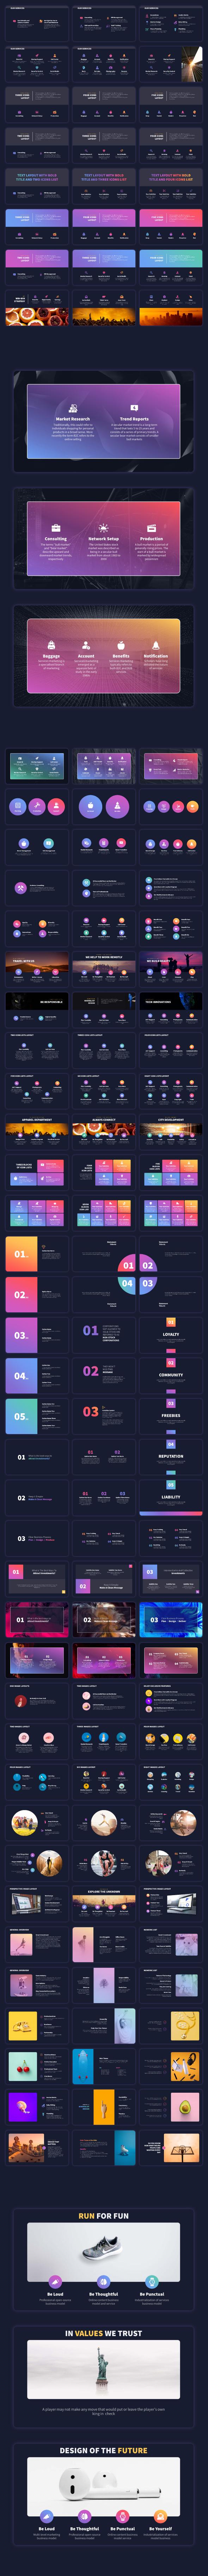 VIVID 2021 - Professional PowerPoint Presentation Template - 18